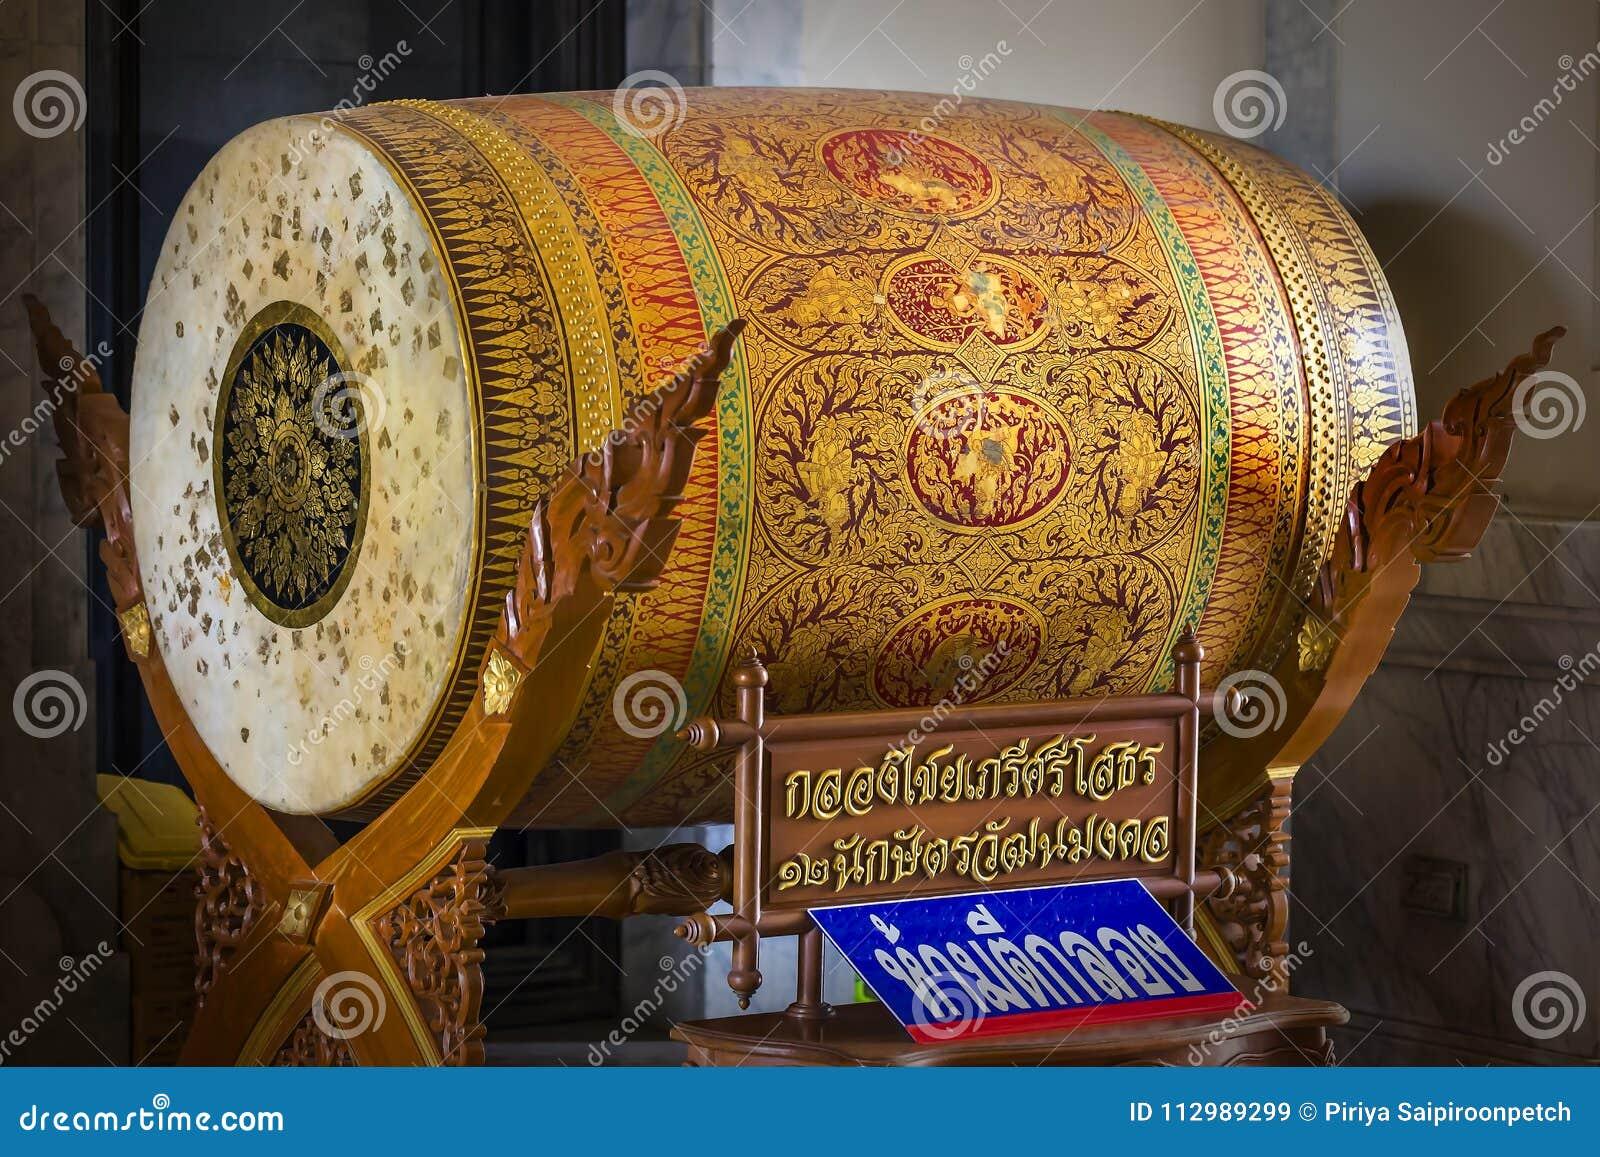 Chachoengsao, THAILAND - March 21, 2018: Big drum at wat sothon wararam worawihan. chachoengsao, Thailand.